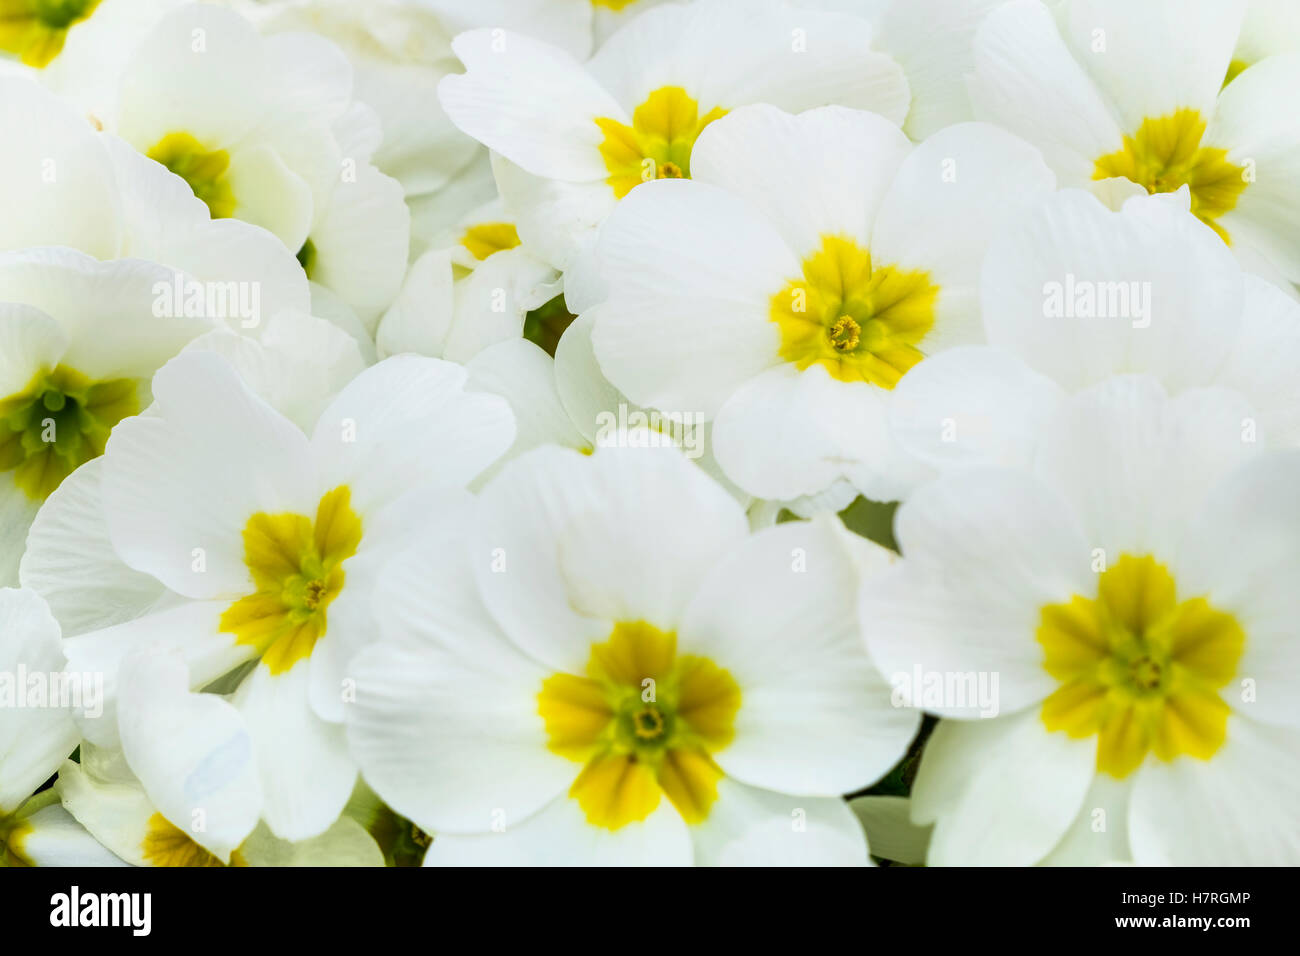 White and yellow flowers in the dublin botanic garden dublin stock white and yellow flowers in the dublin botanic garden dublin leinster ireland mightylinksfo